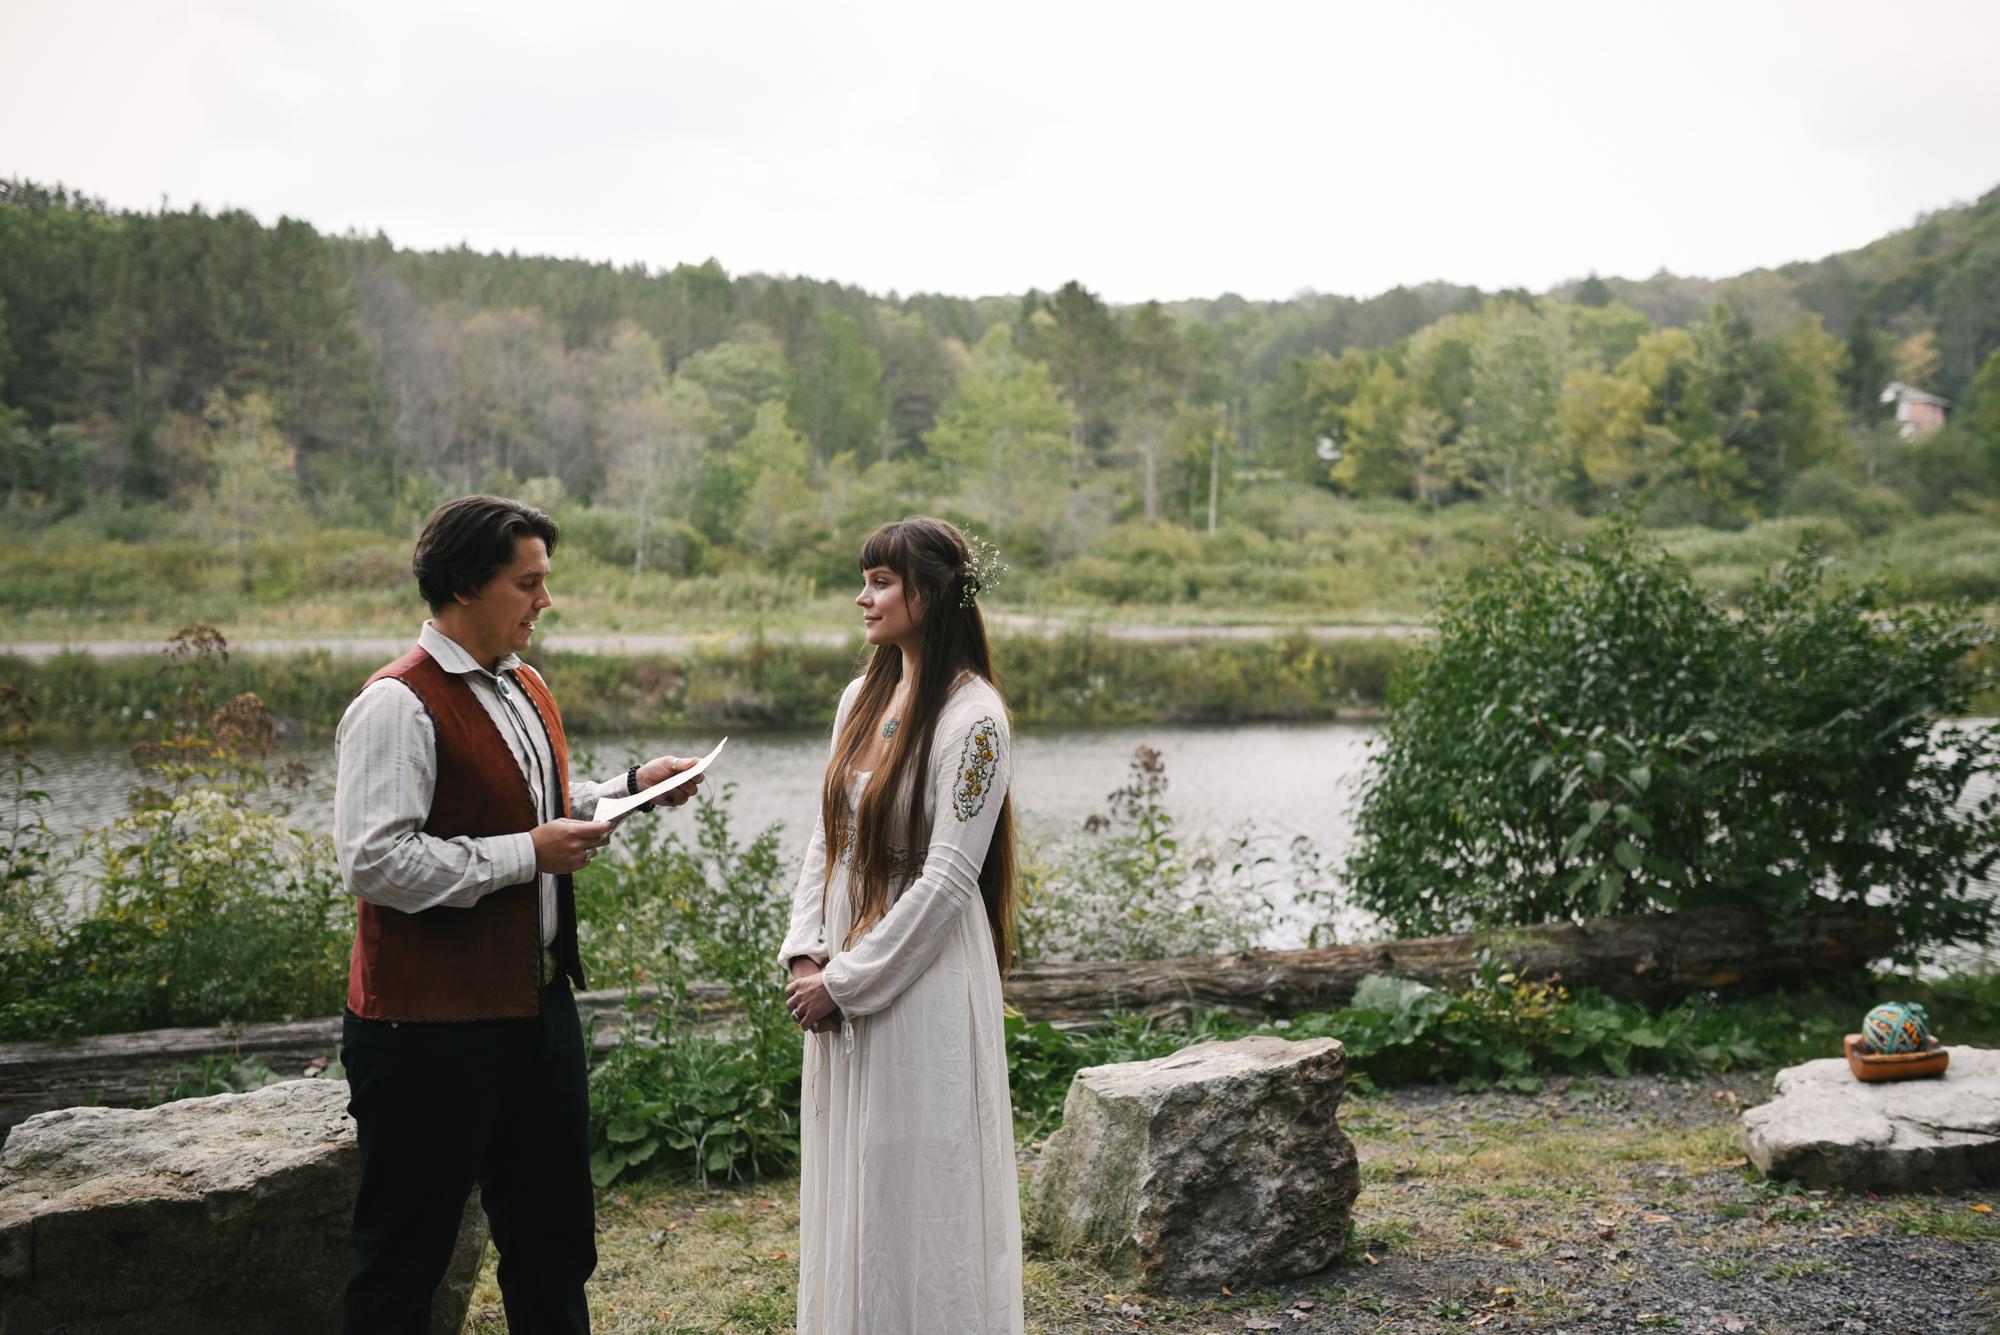 Mountain Wedding, Outdoors, Rustic, West Virginia, Maryland Wedding Photographer, DIY, Casual, Bride and Groom exchanging vows, boho wedding